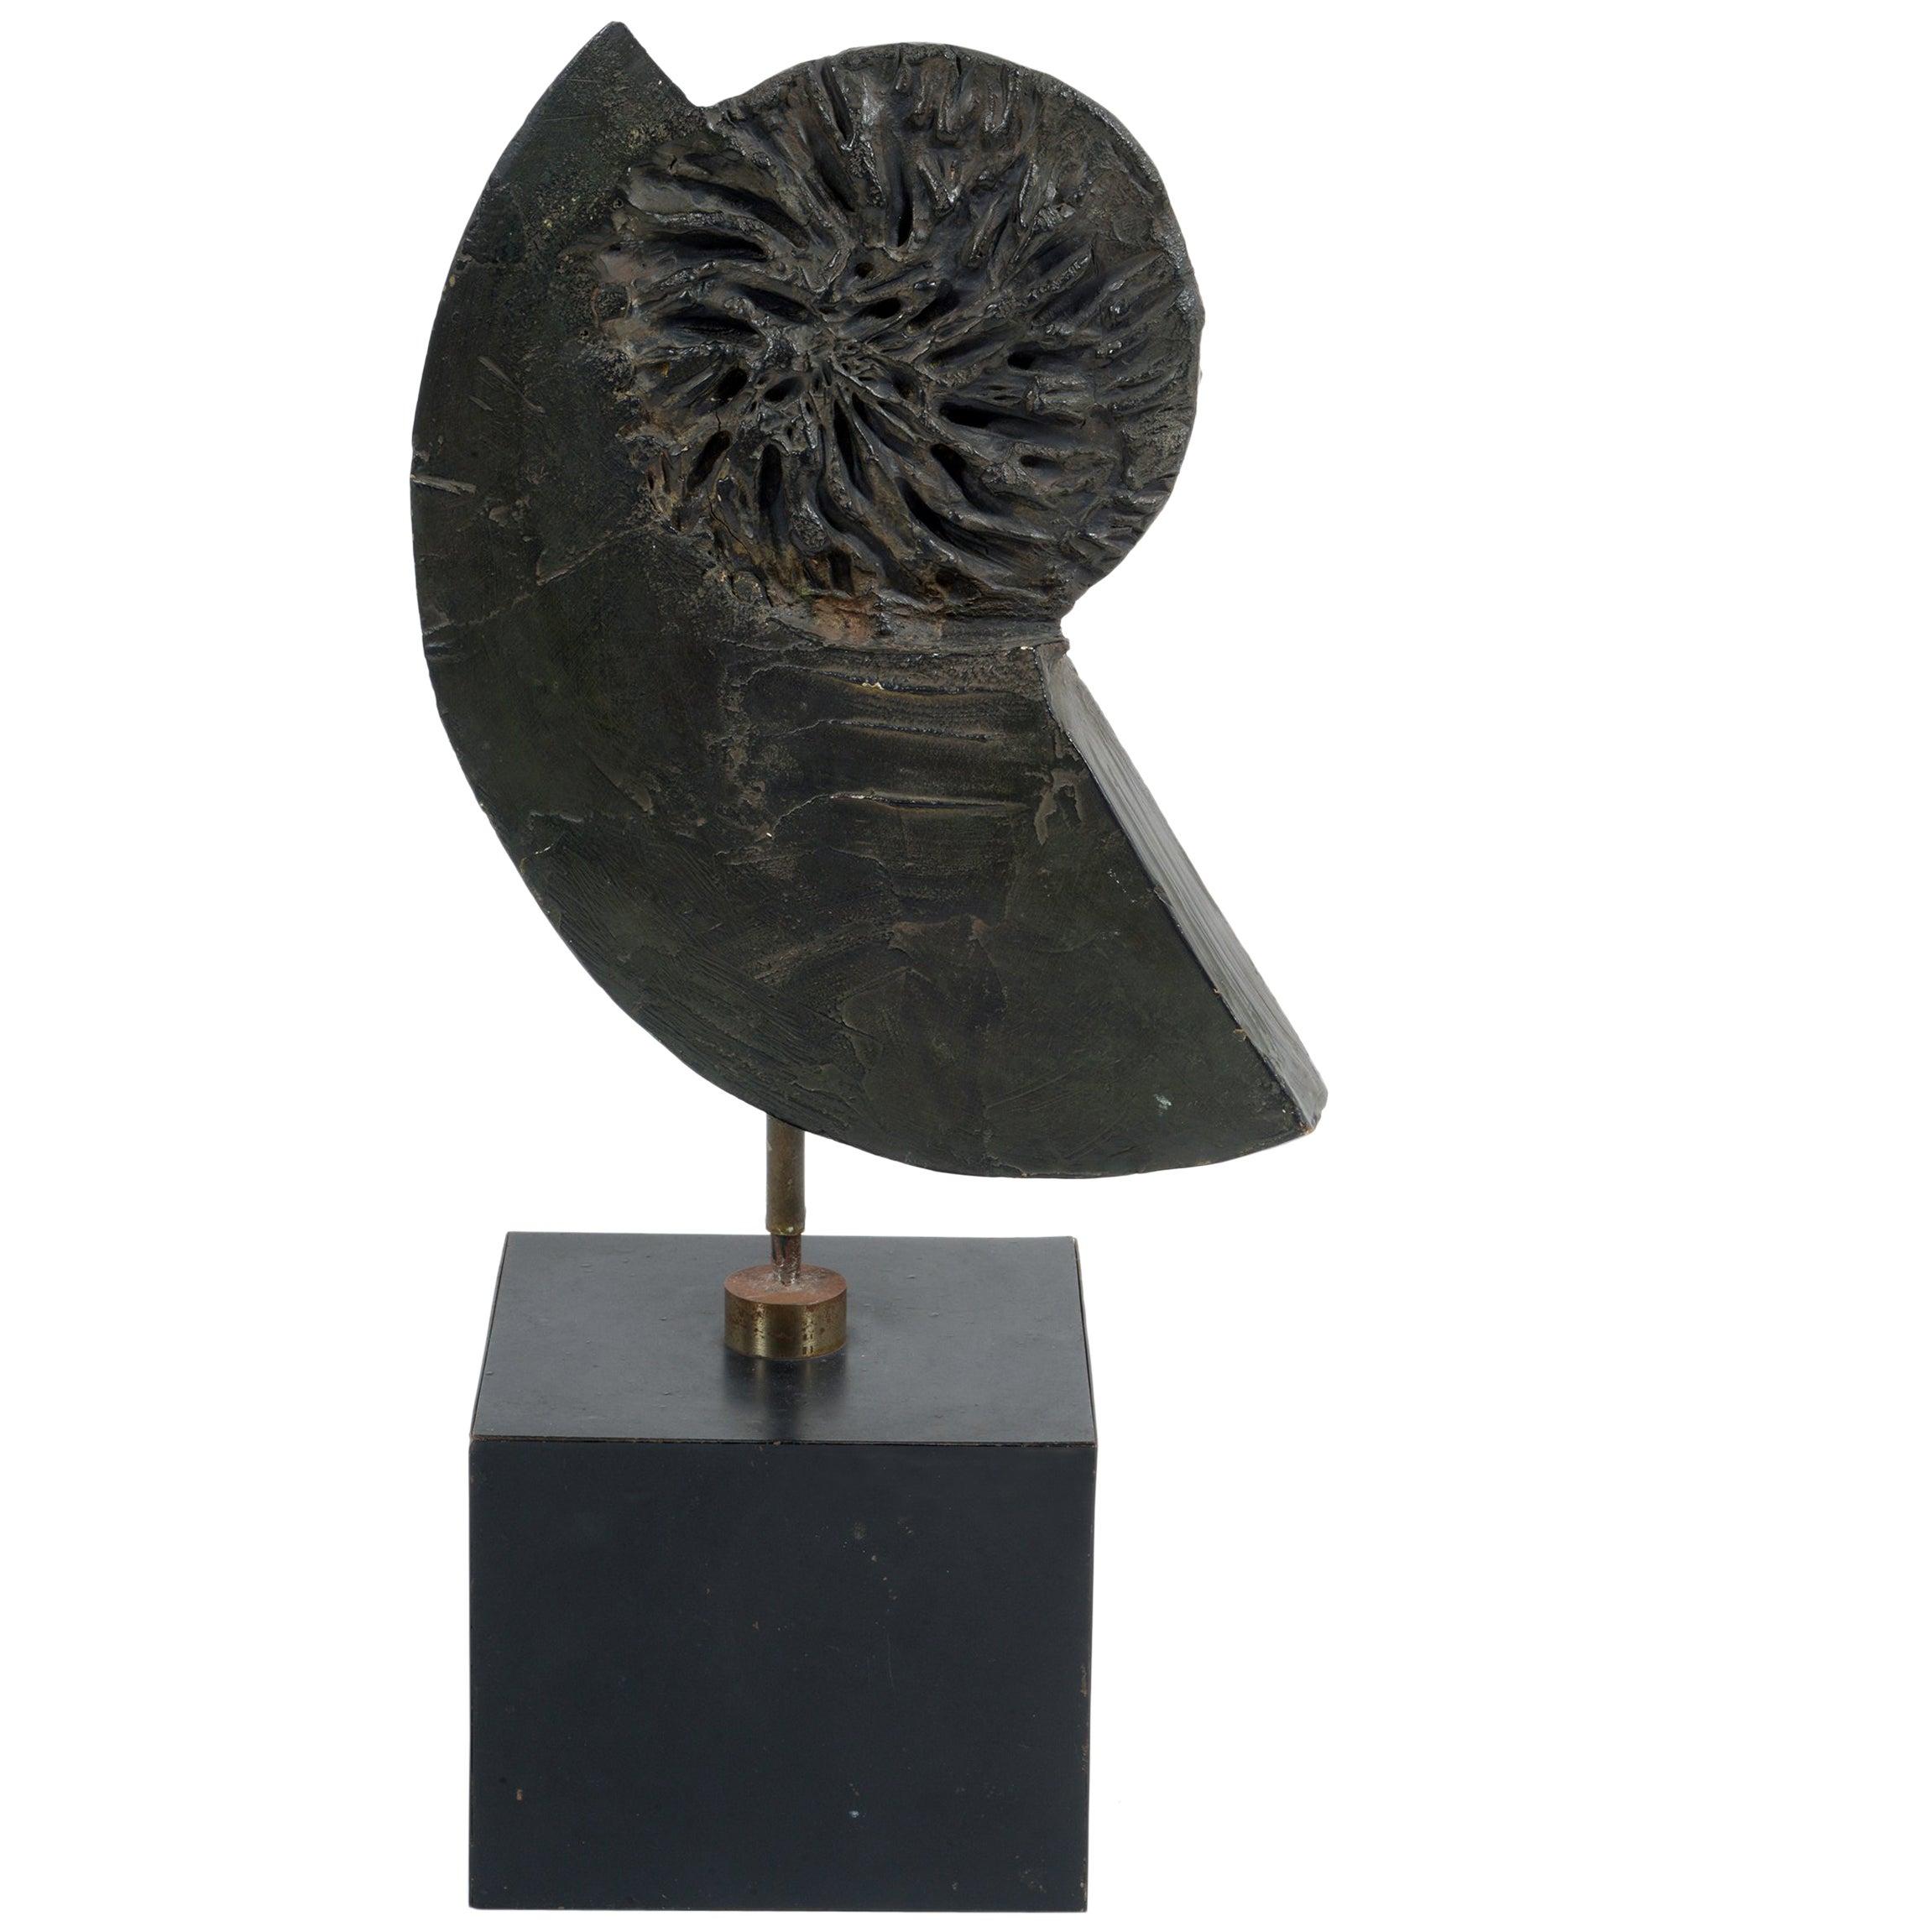 Mid-Century Sculpture by the Master Ceramist Marcello Fantoni, Signed